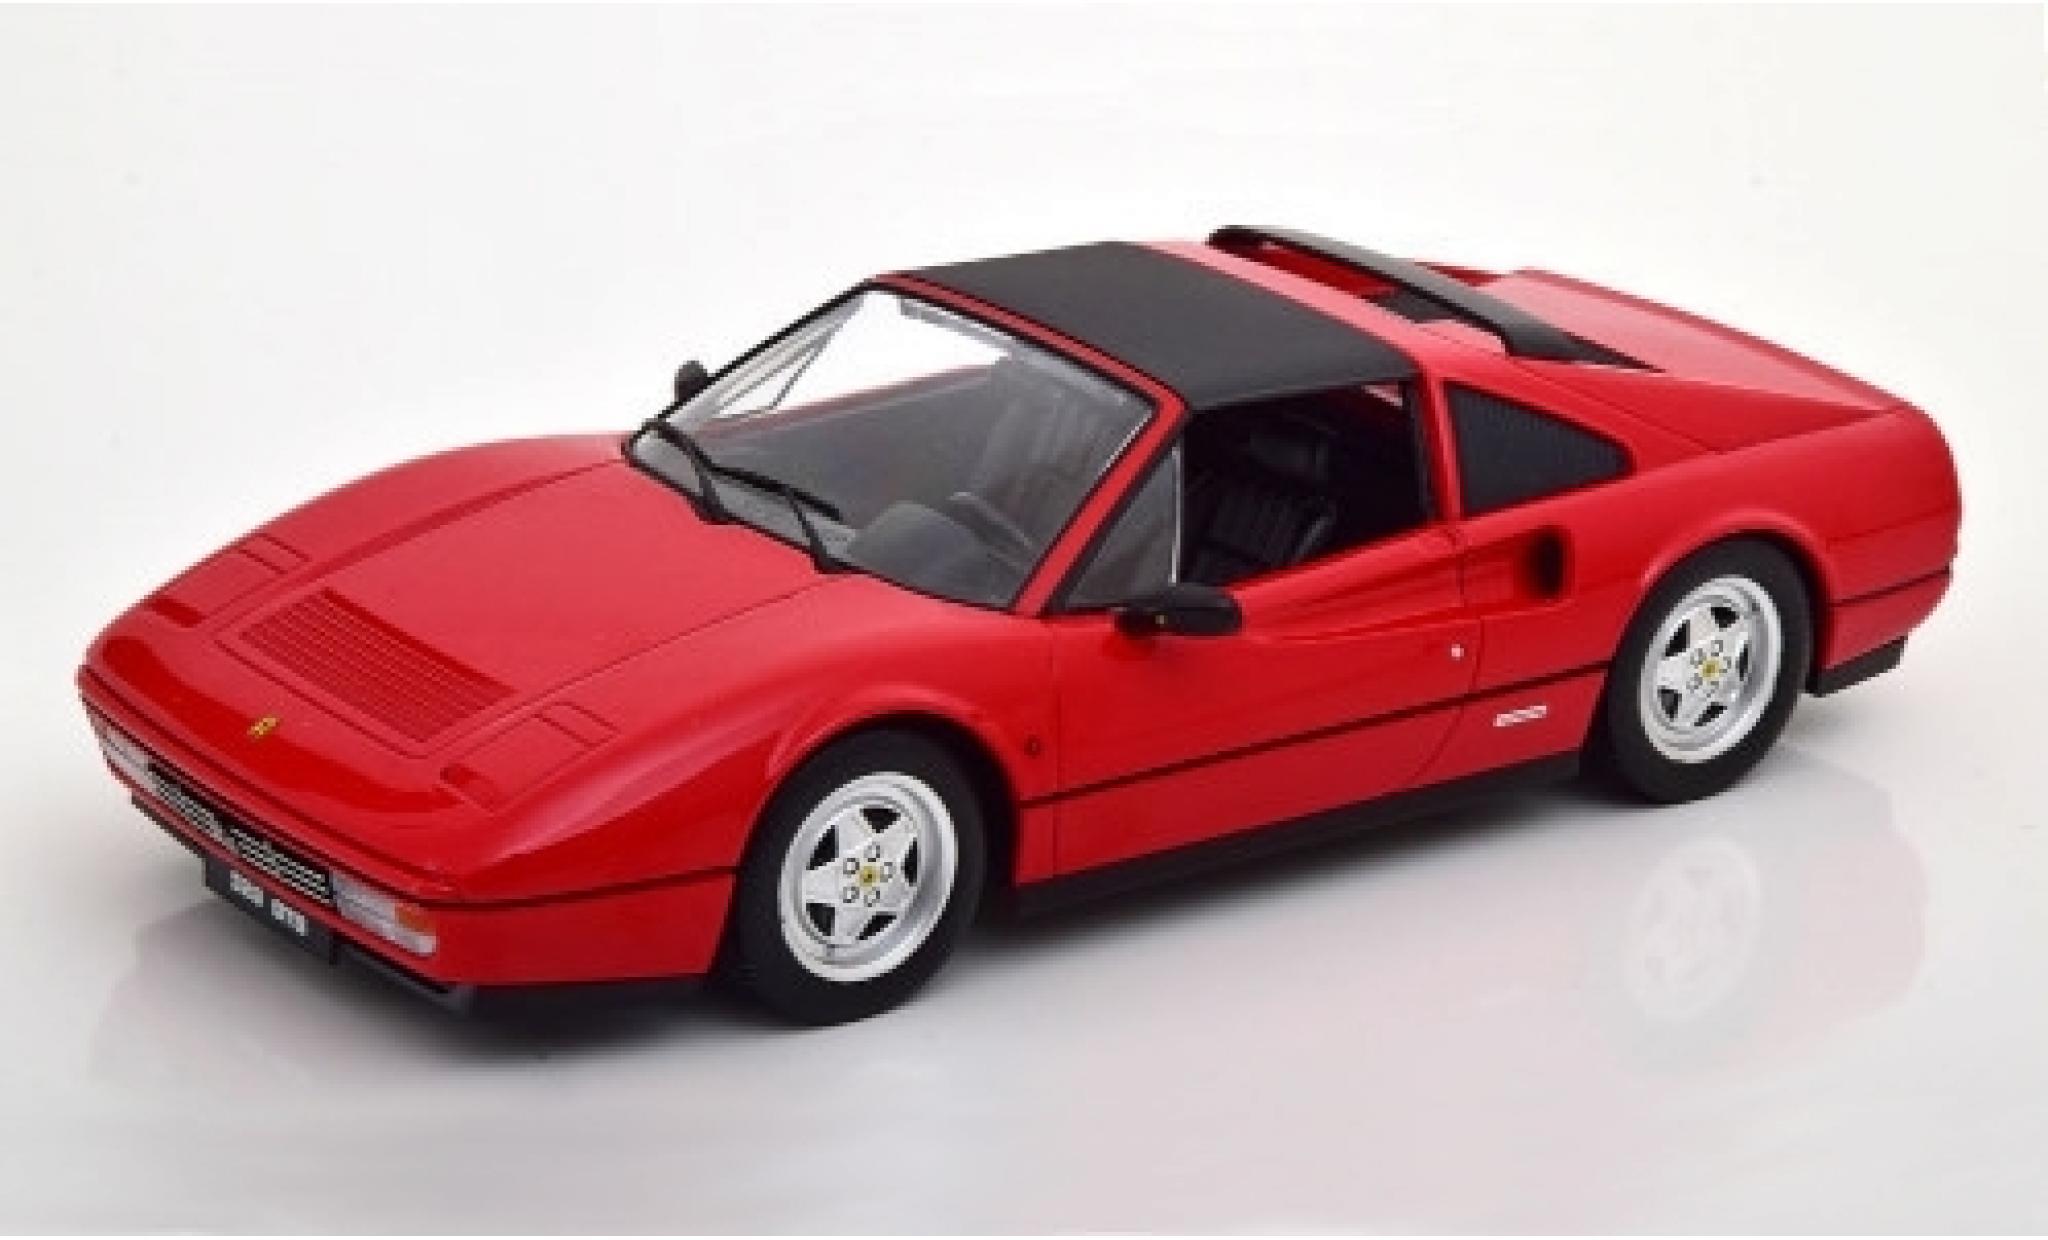 Ferrari 328 1/18 KK Scale GTS rot 1985 Targadach détachable